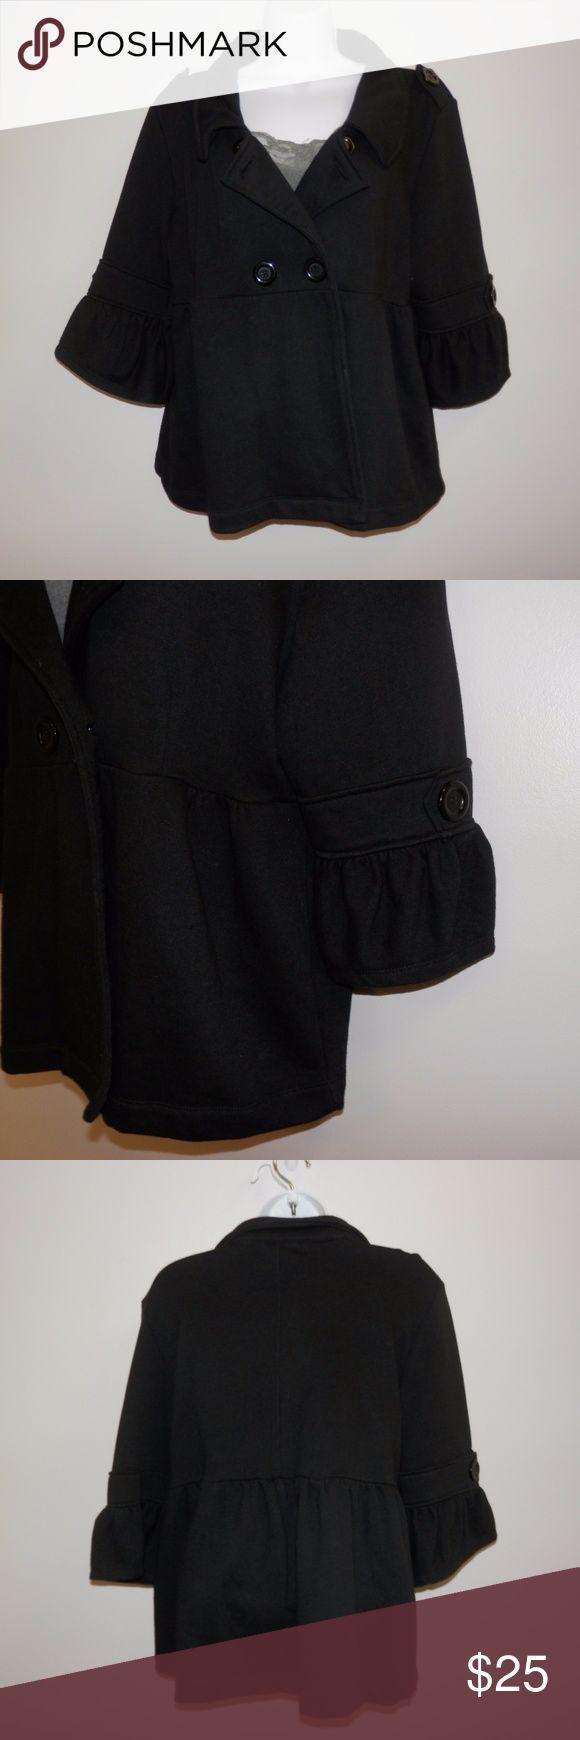 Sz L Luii Anthropology Black Pea Coat 3/4 Sleeve` Luii Sz L Black pea coat with 3/4 sleeves. Sweat shirt material. Super comfy. Good condition Anthropologie Jackets & Coats Pea Coats